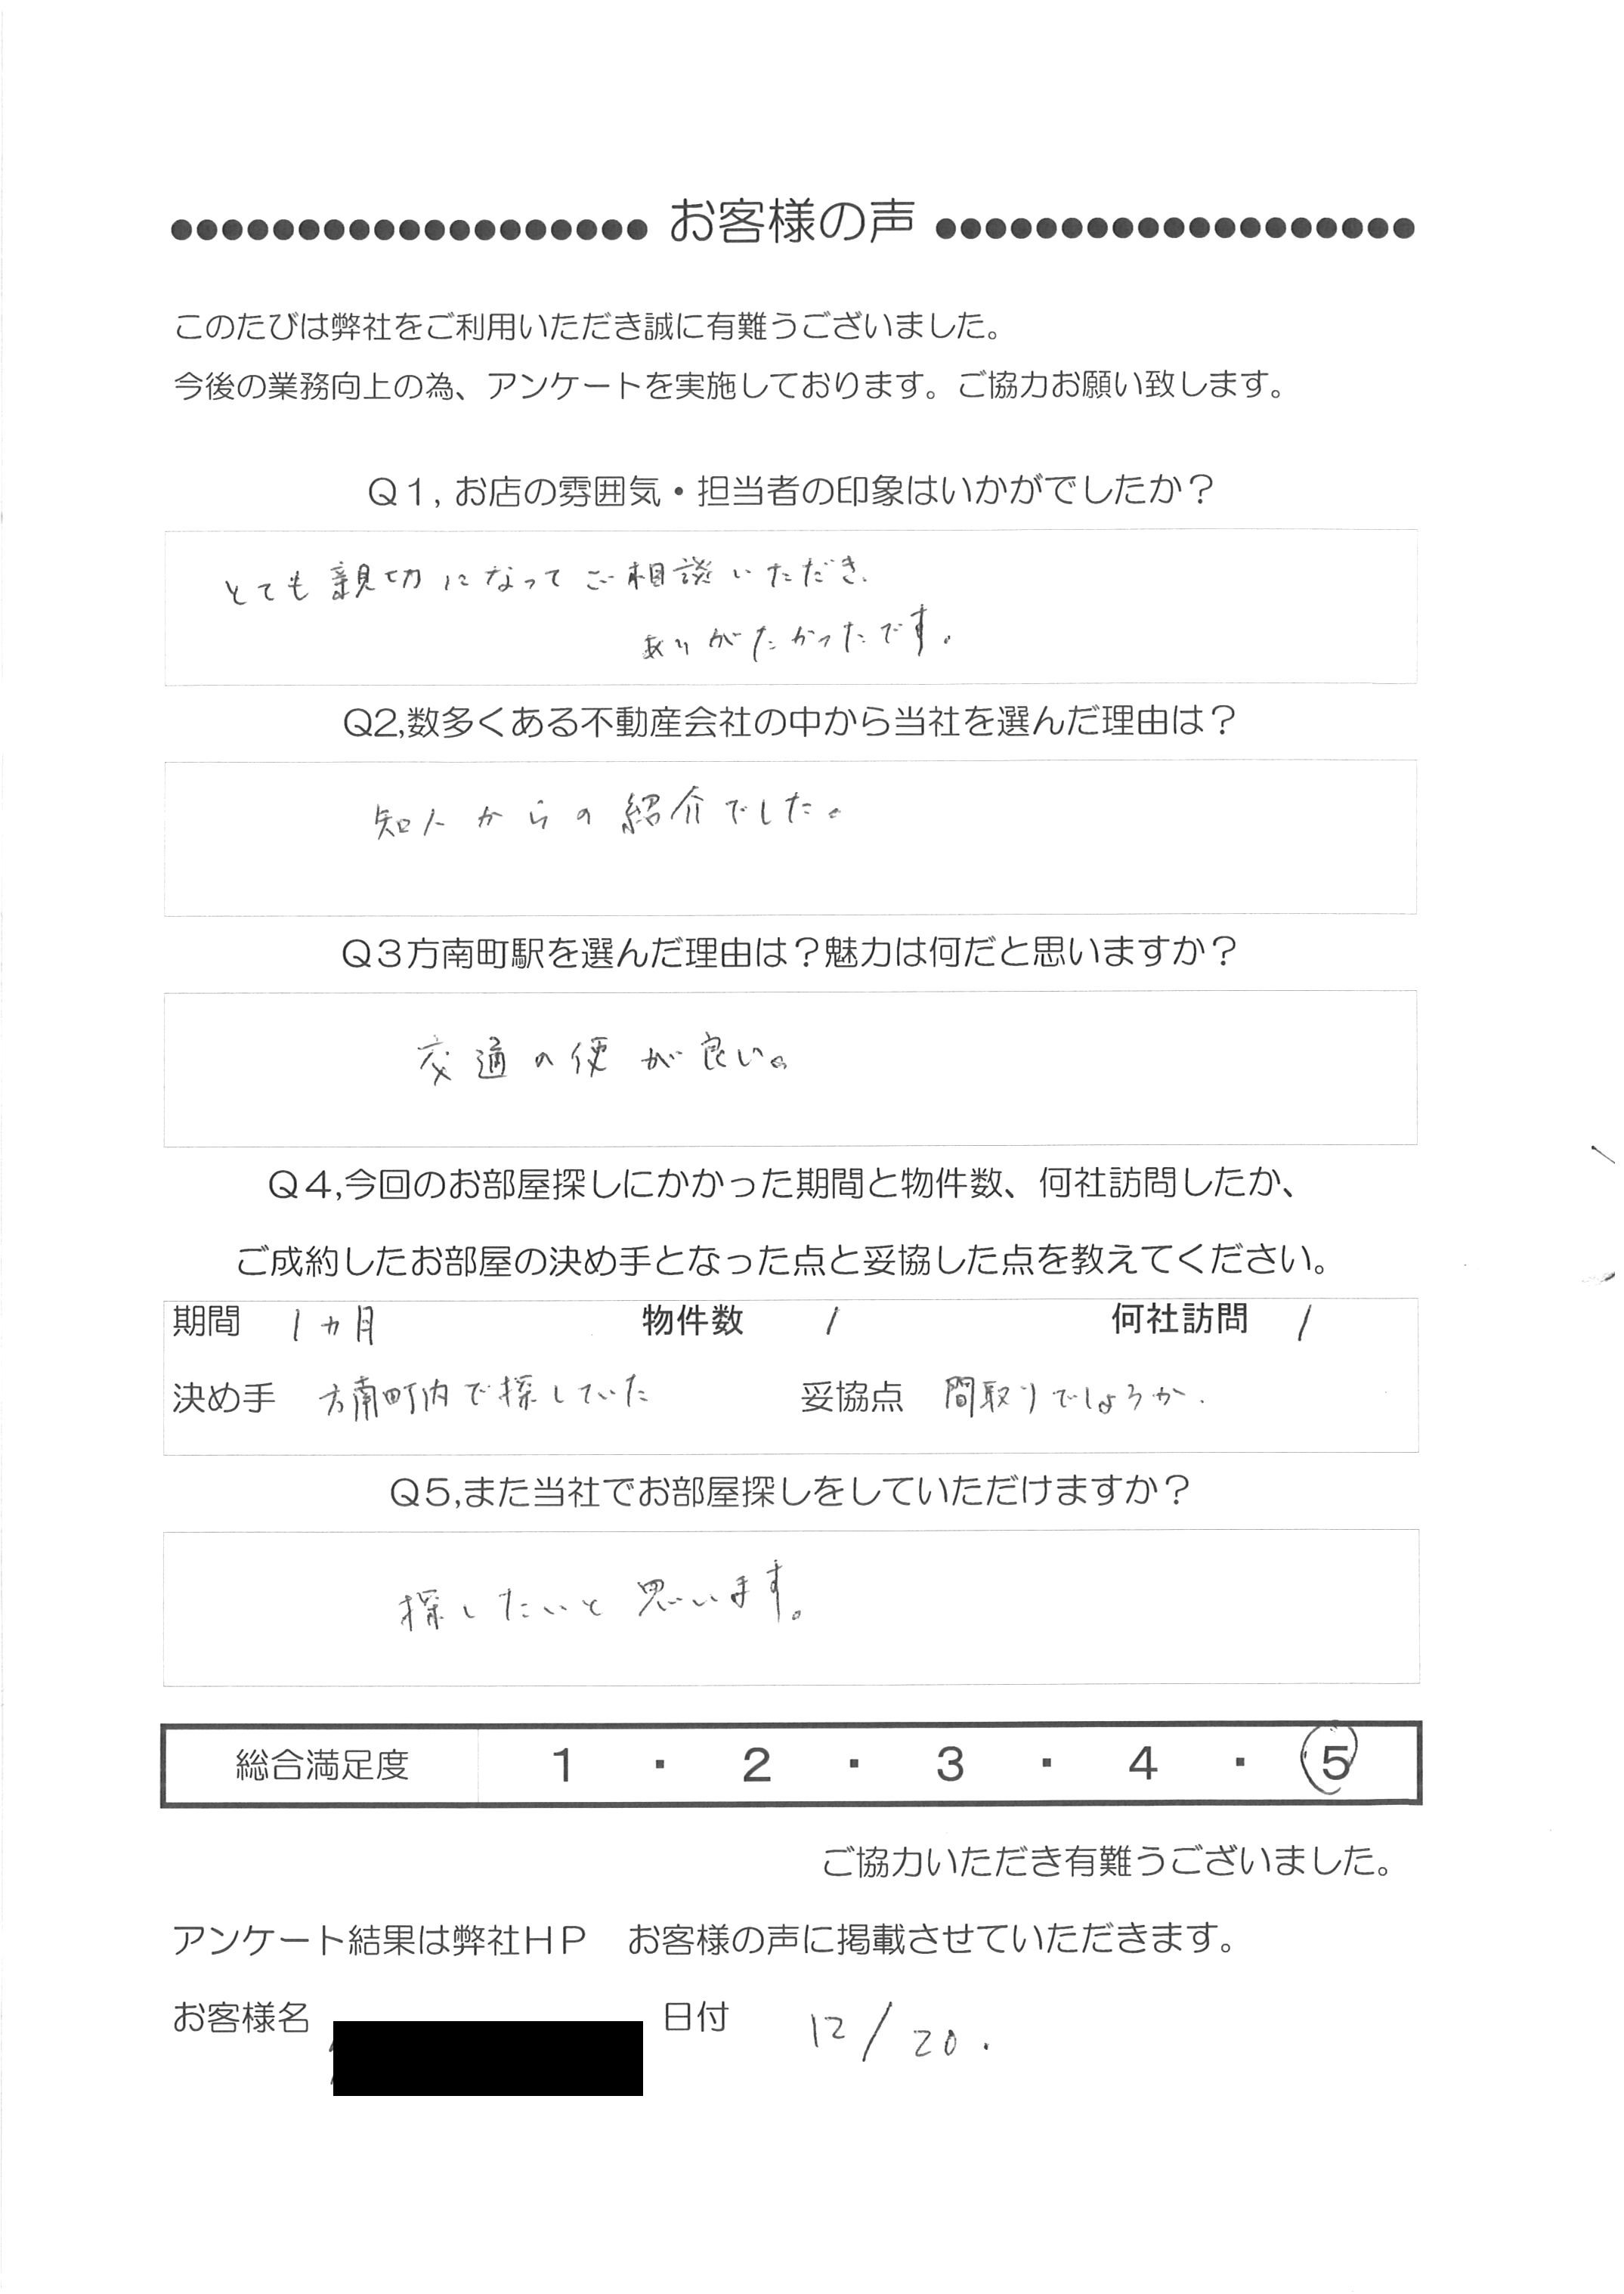 K・K 様 (32歳)男性(会社員)入居人員(2名)アンケート回答